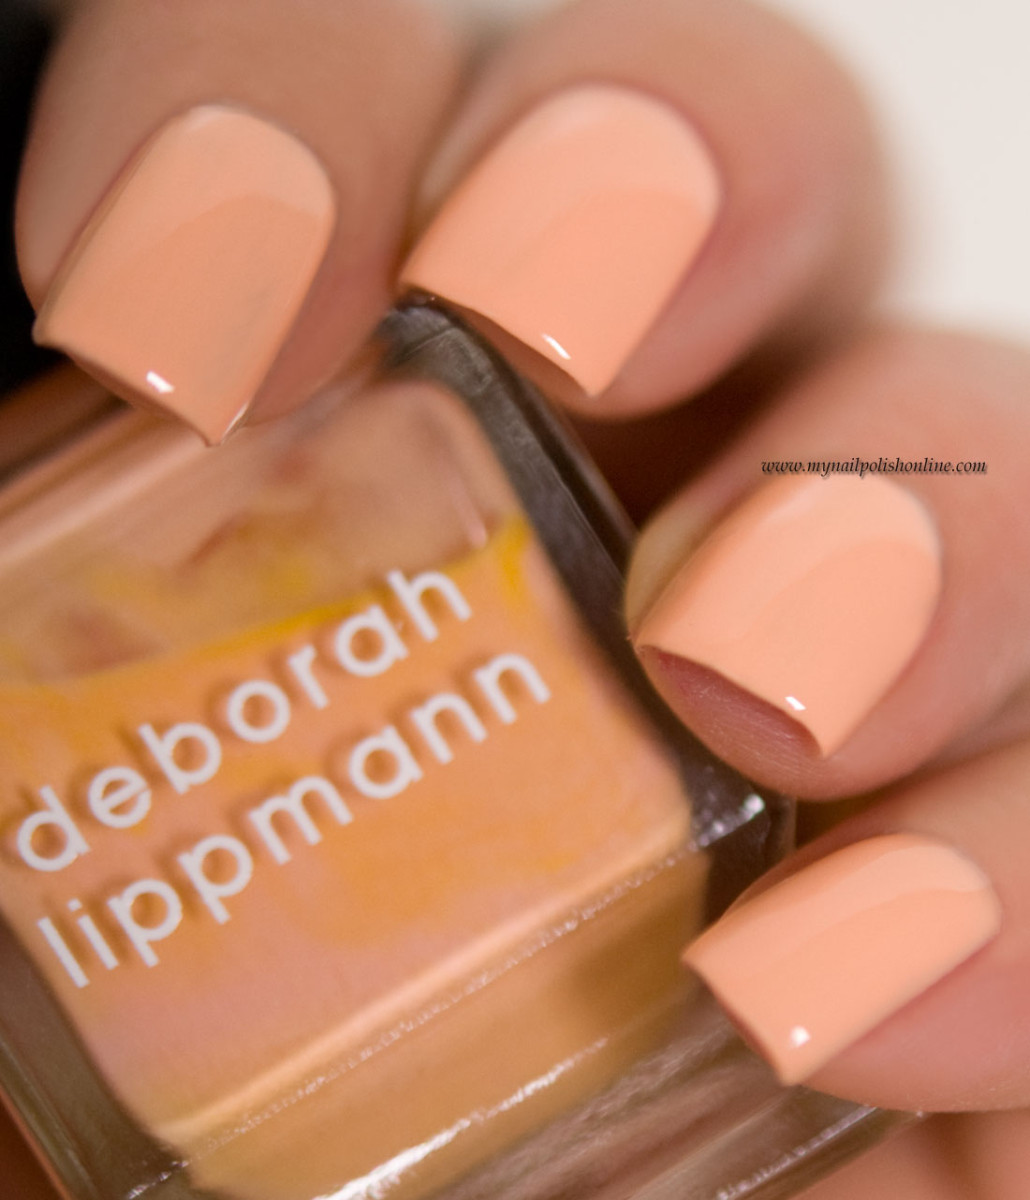 Deborah Lippmann - Tip toe through the tulips